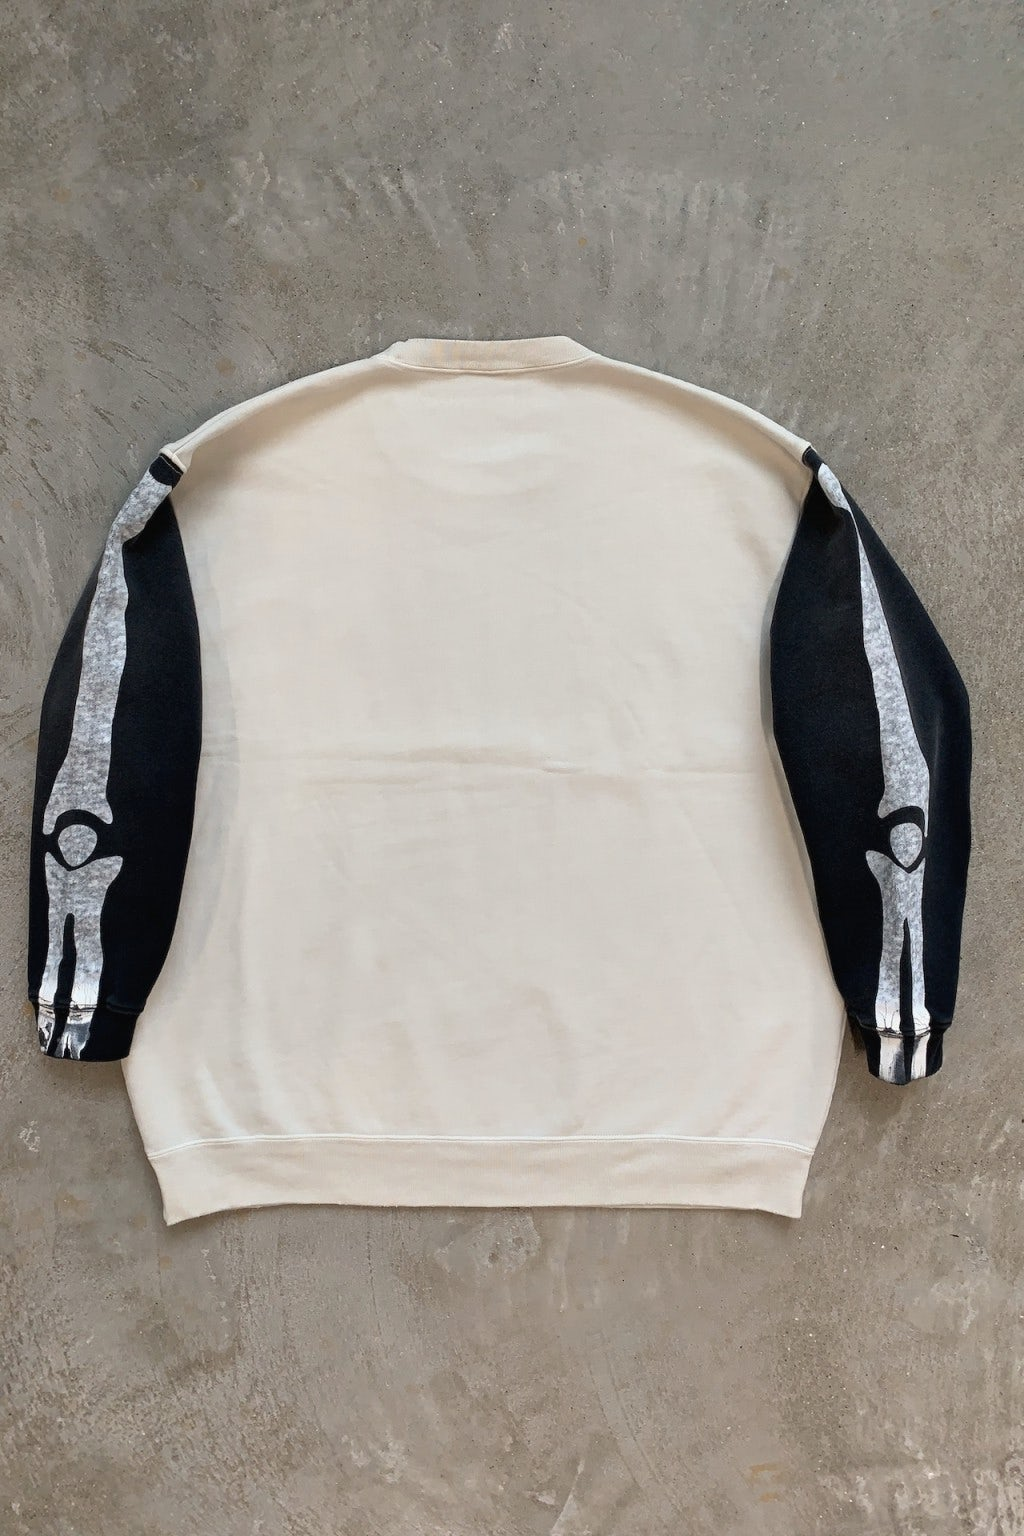 Kapital Fleecy Knit 2TONE Sleep Remake BIG SWT BNA (Bone)